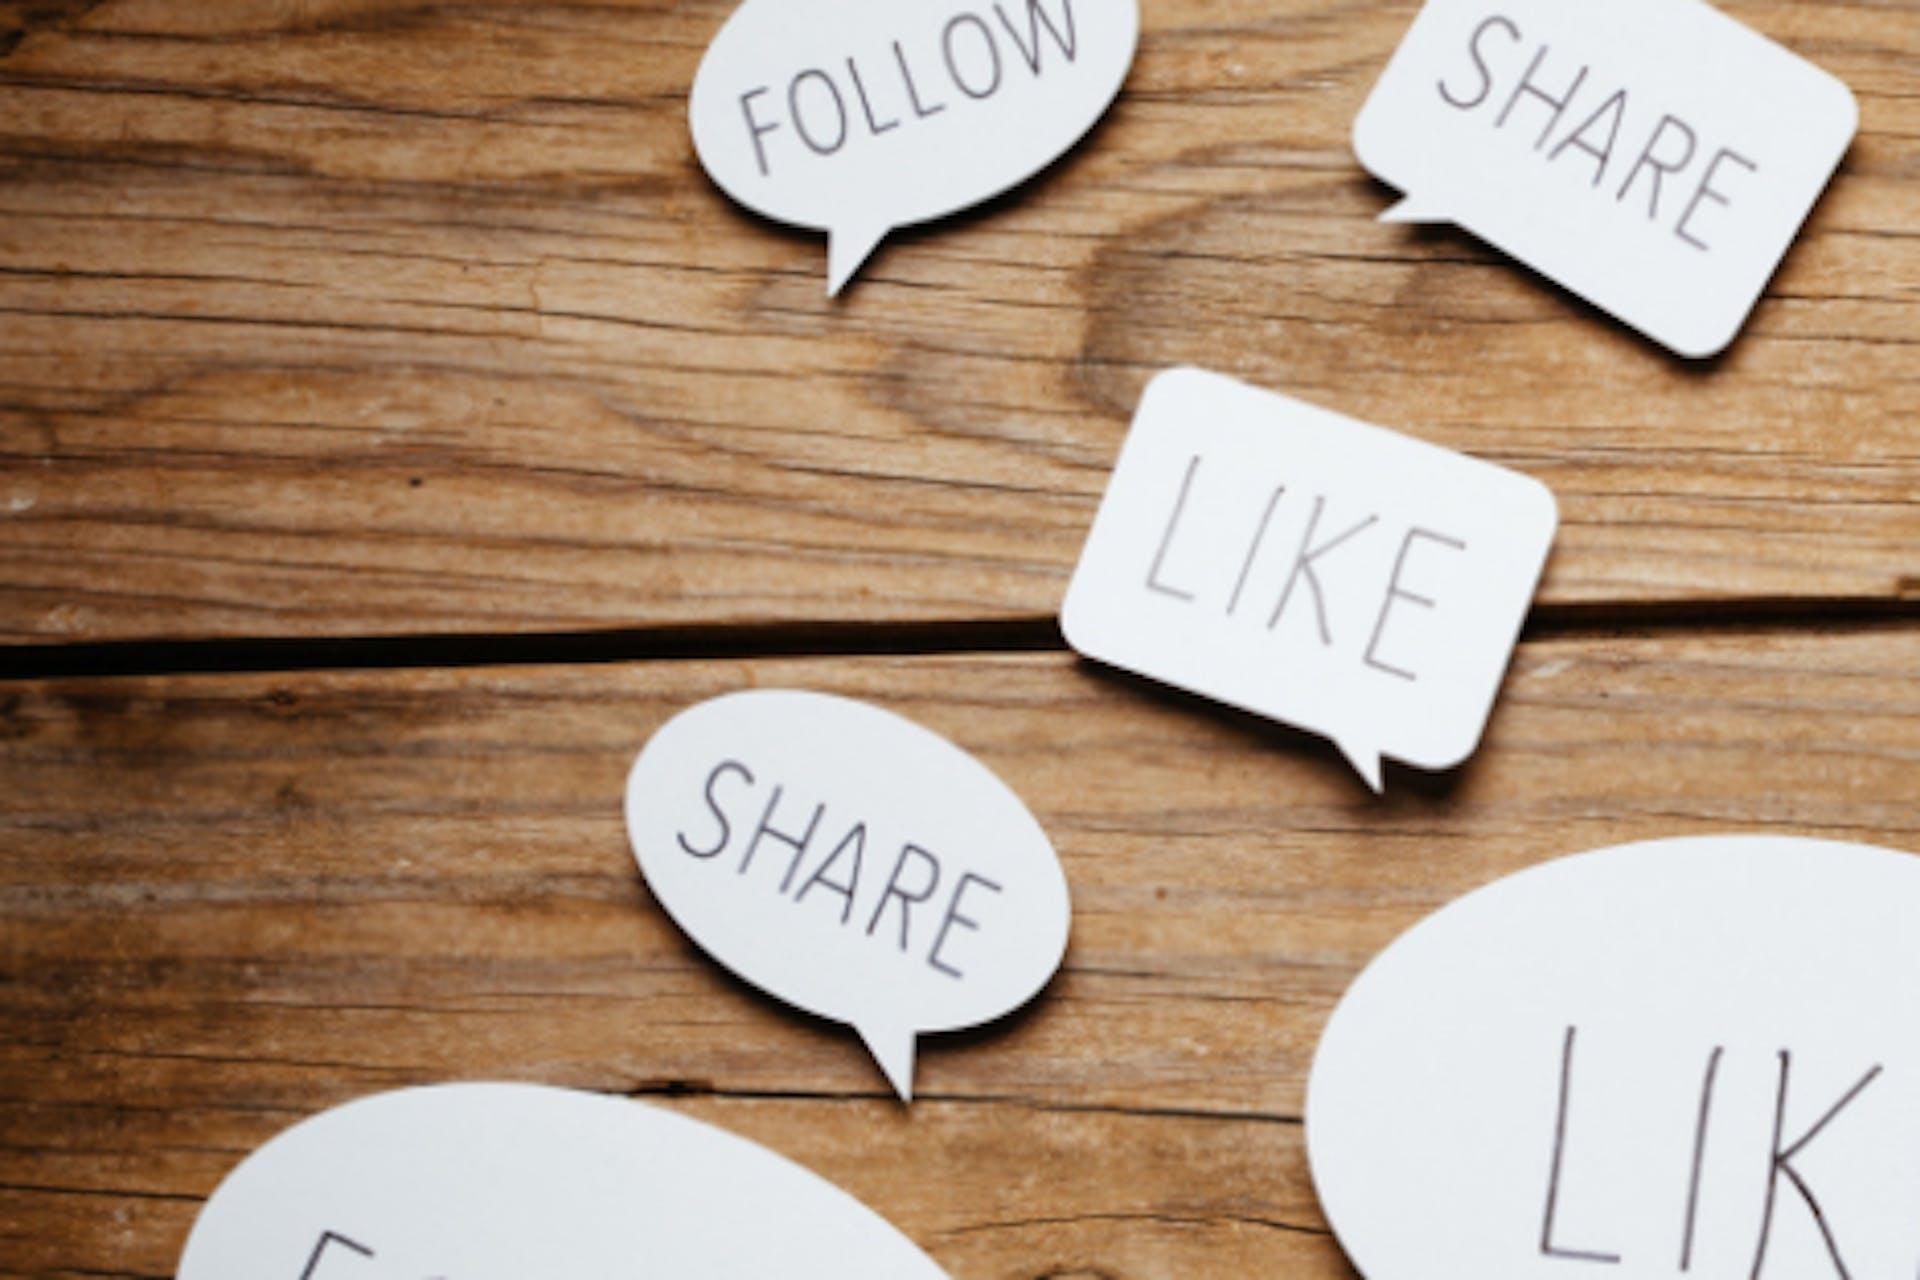 Follow Share Like Sprechblasen Community Management